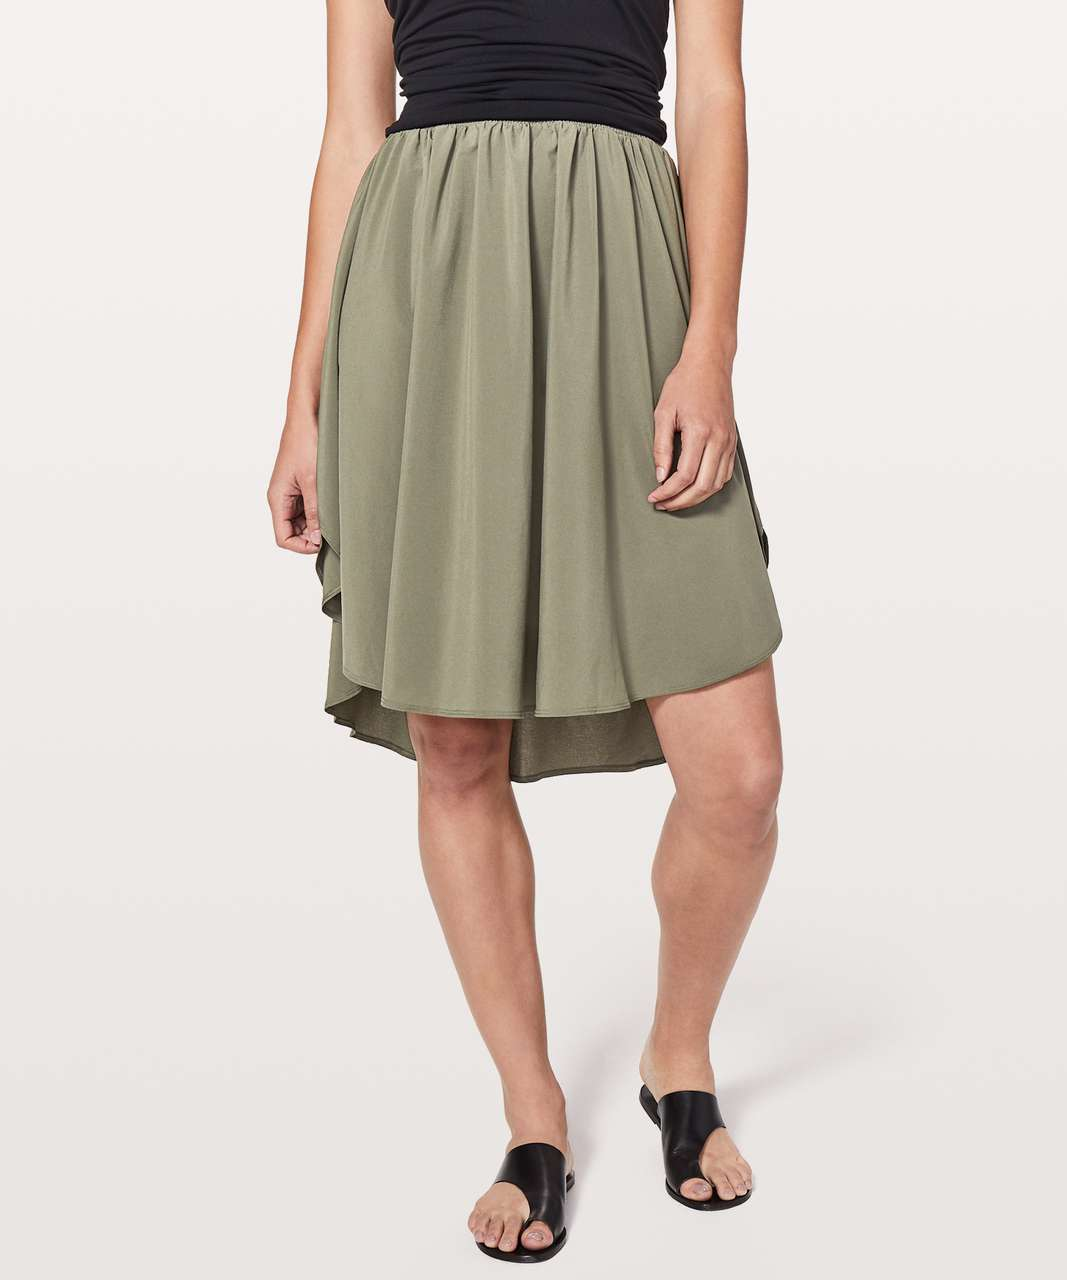 Lululemon The Everyday Skirt - Sage